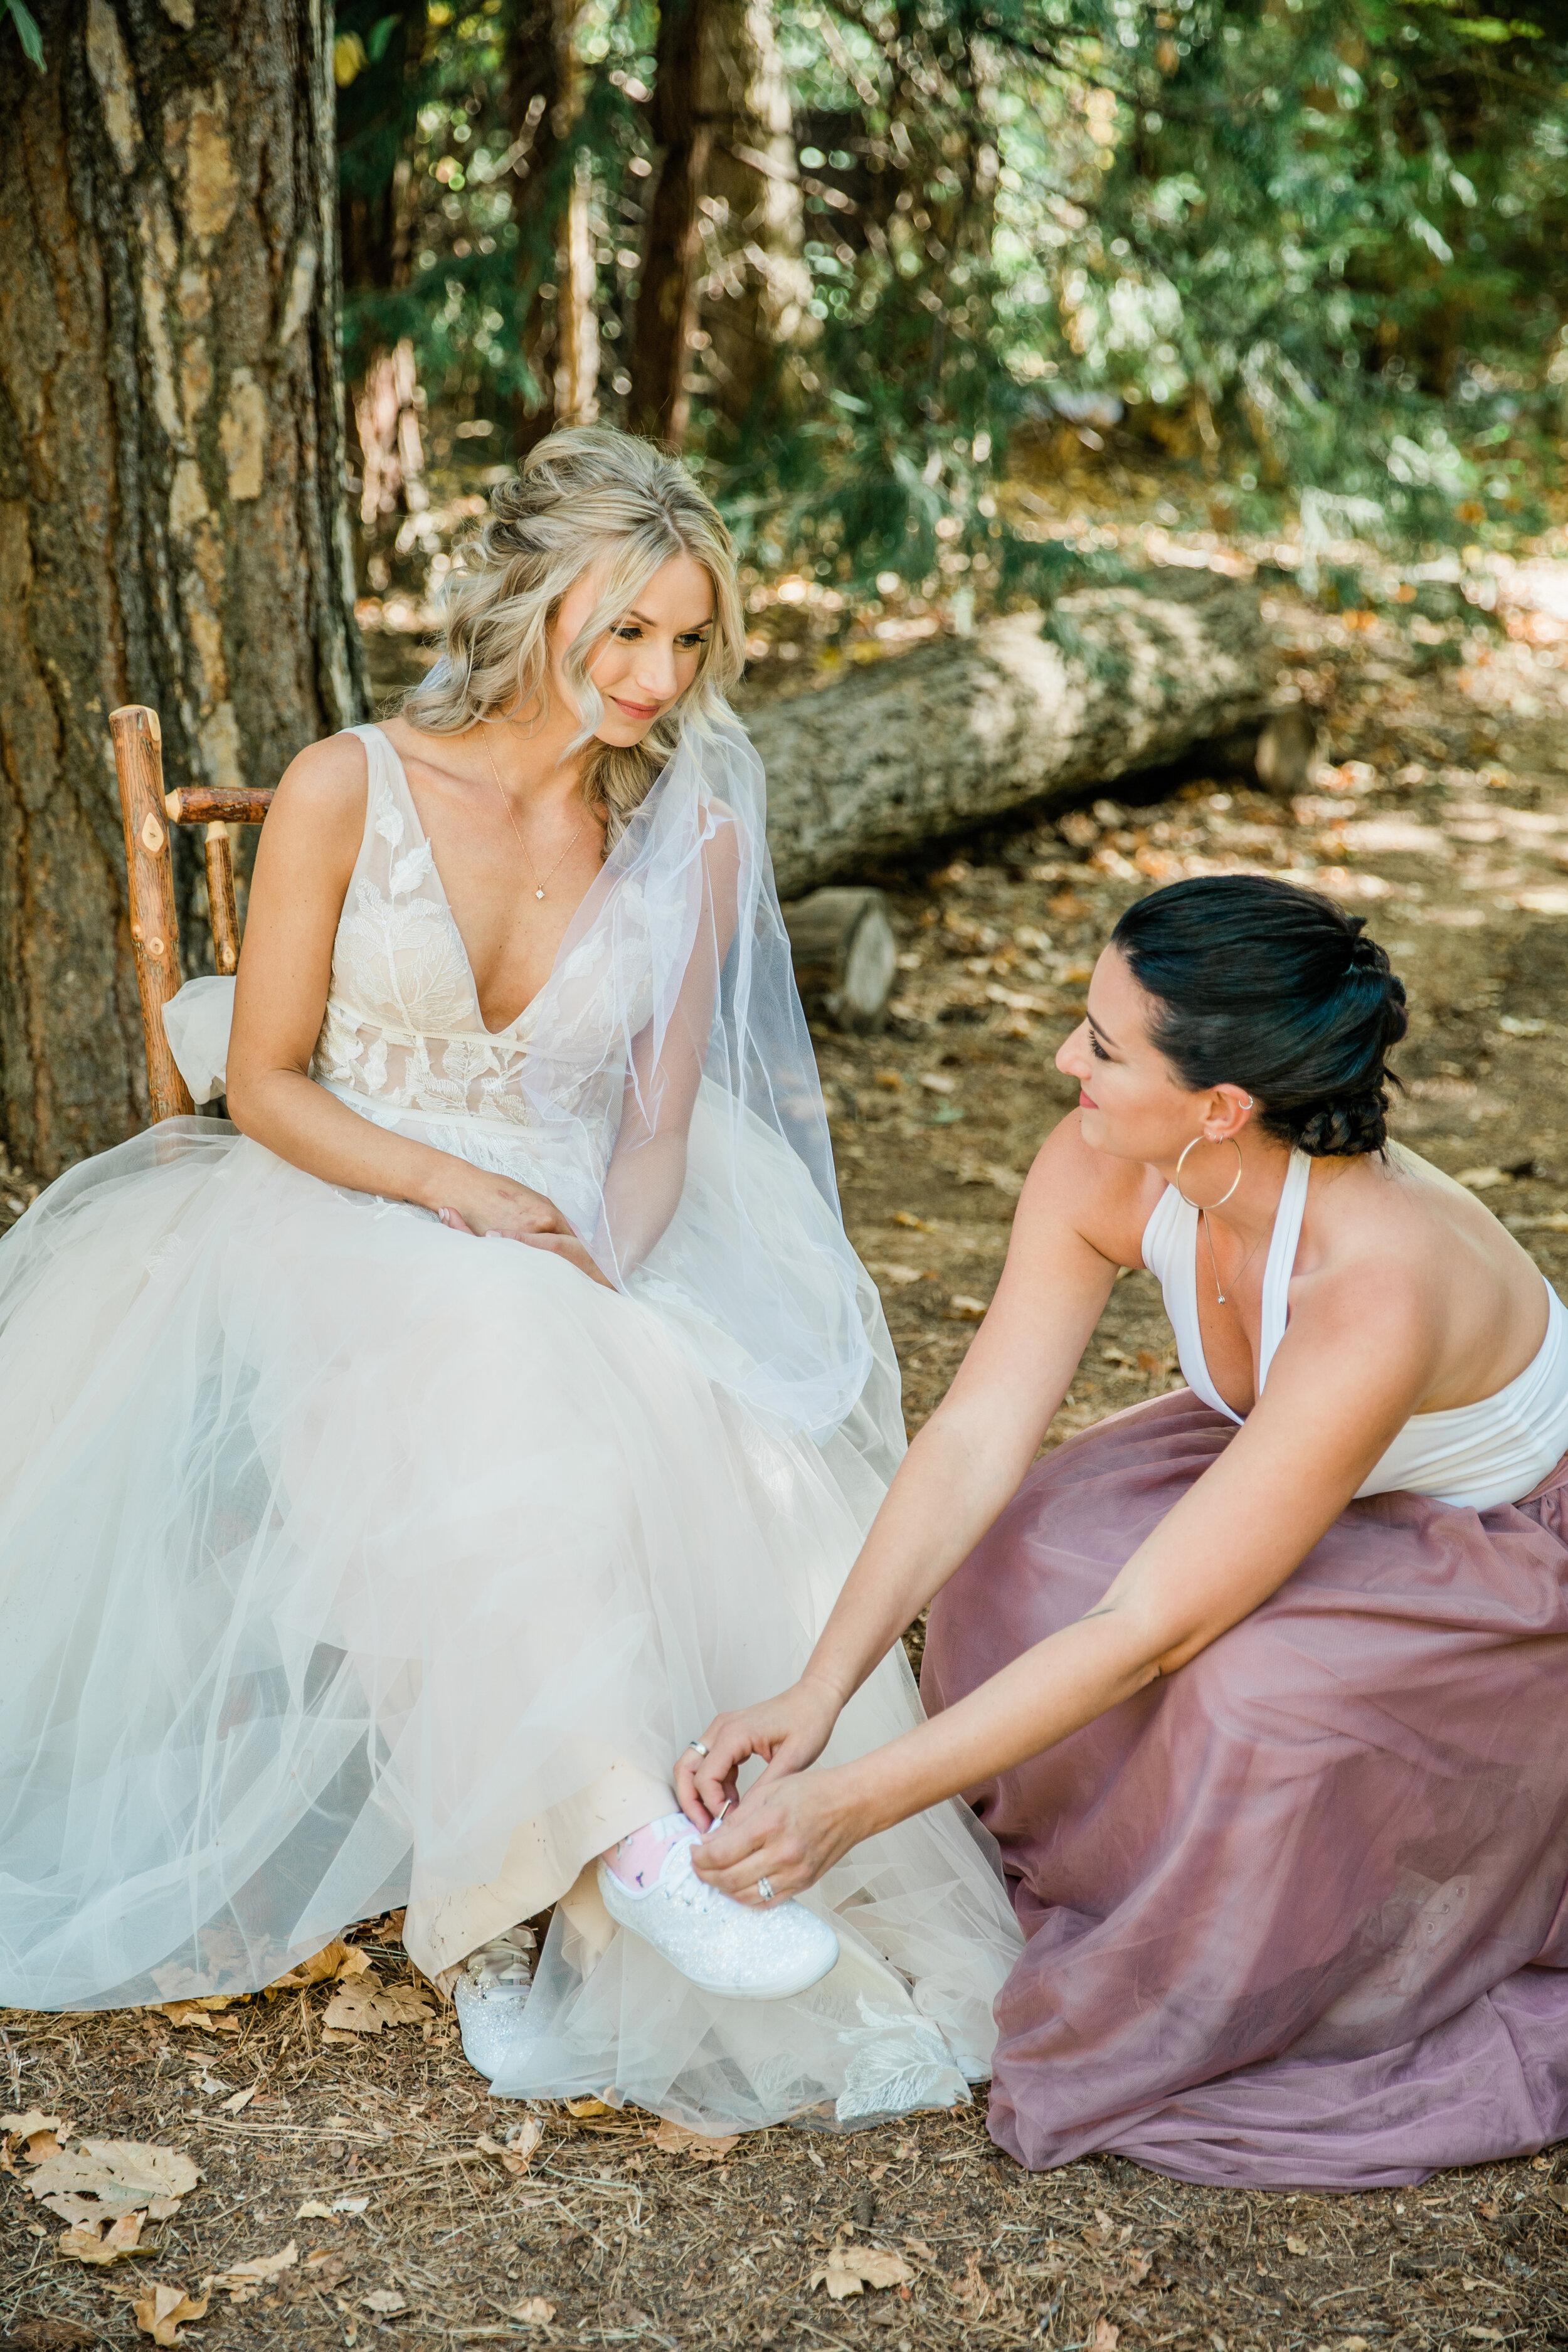 Leanne and Joe - Married - Sneak Peeks - Lauren Alisse Photography-12.jpg